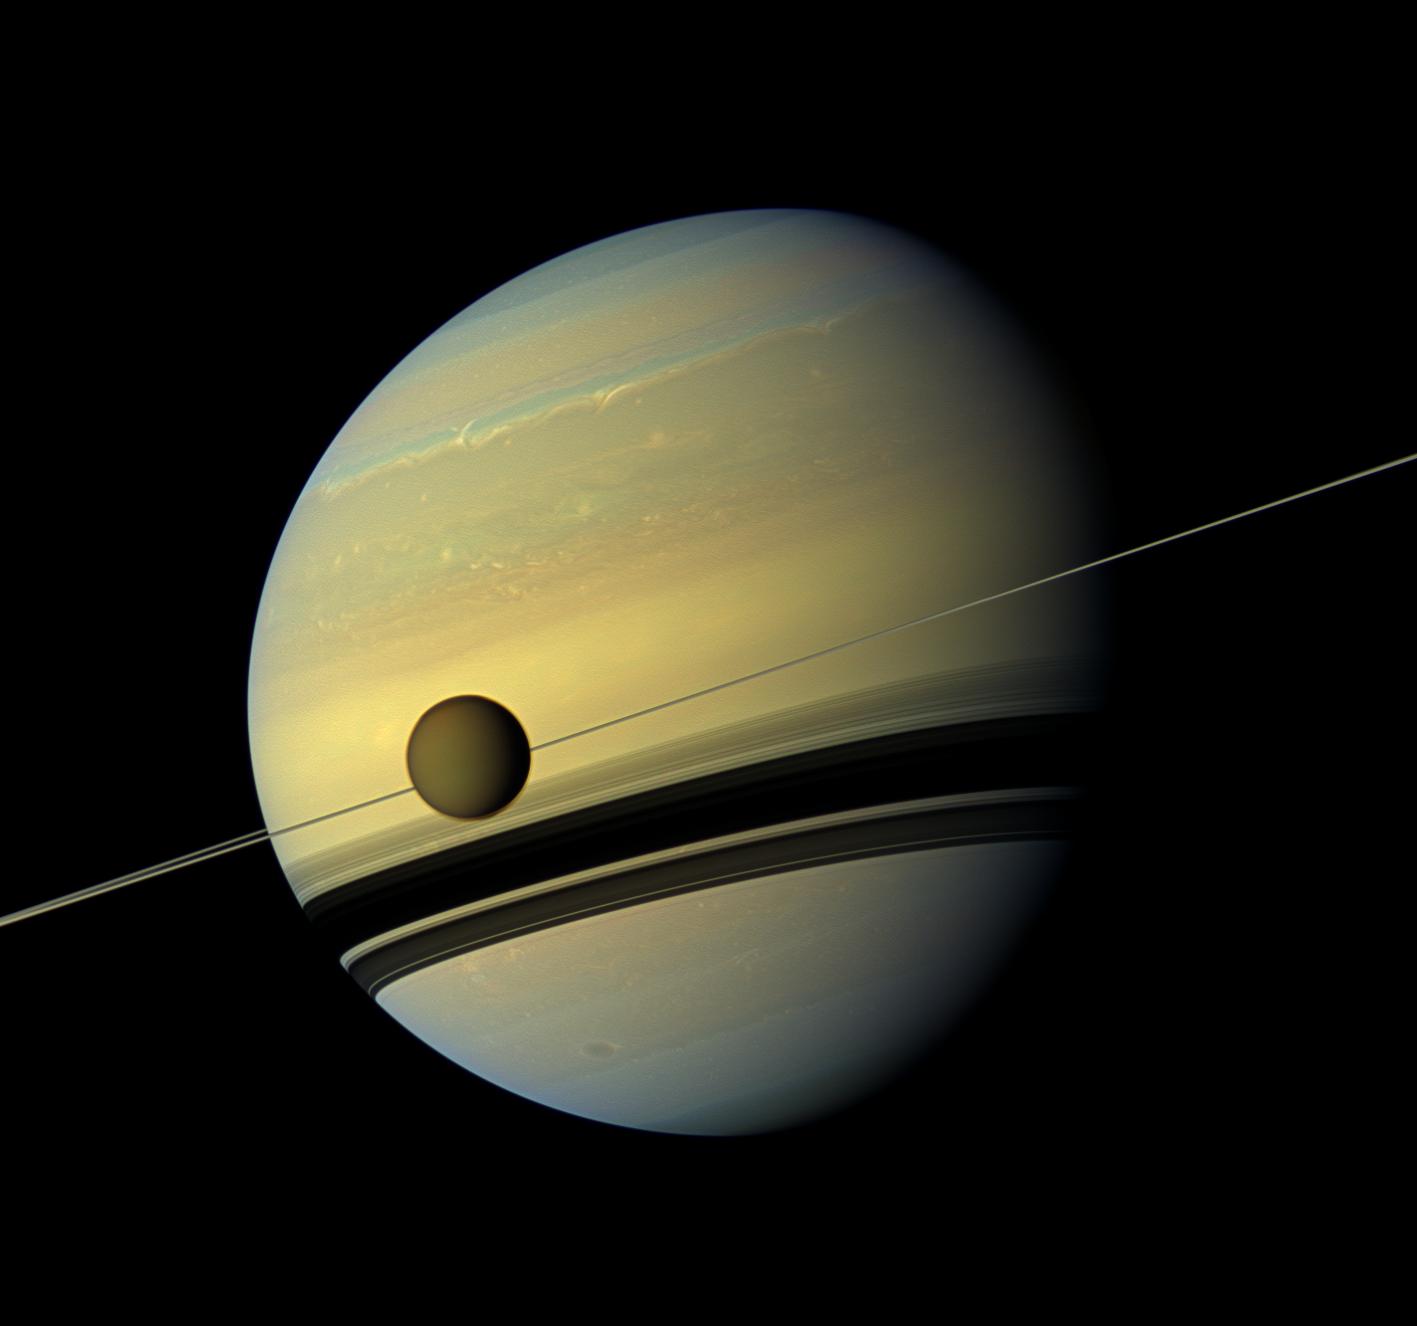 Cassini: The Wonder of Saturn (Video) | NASA Solar System ...